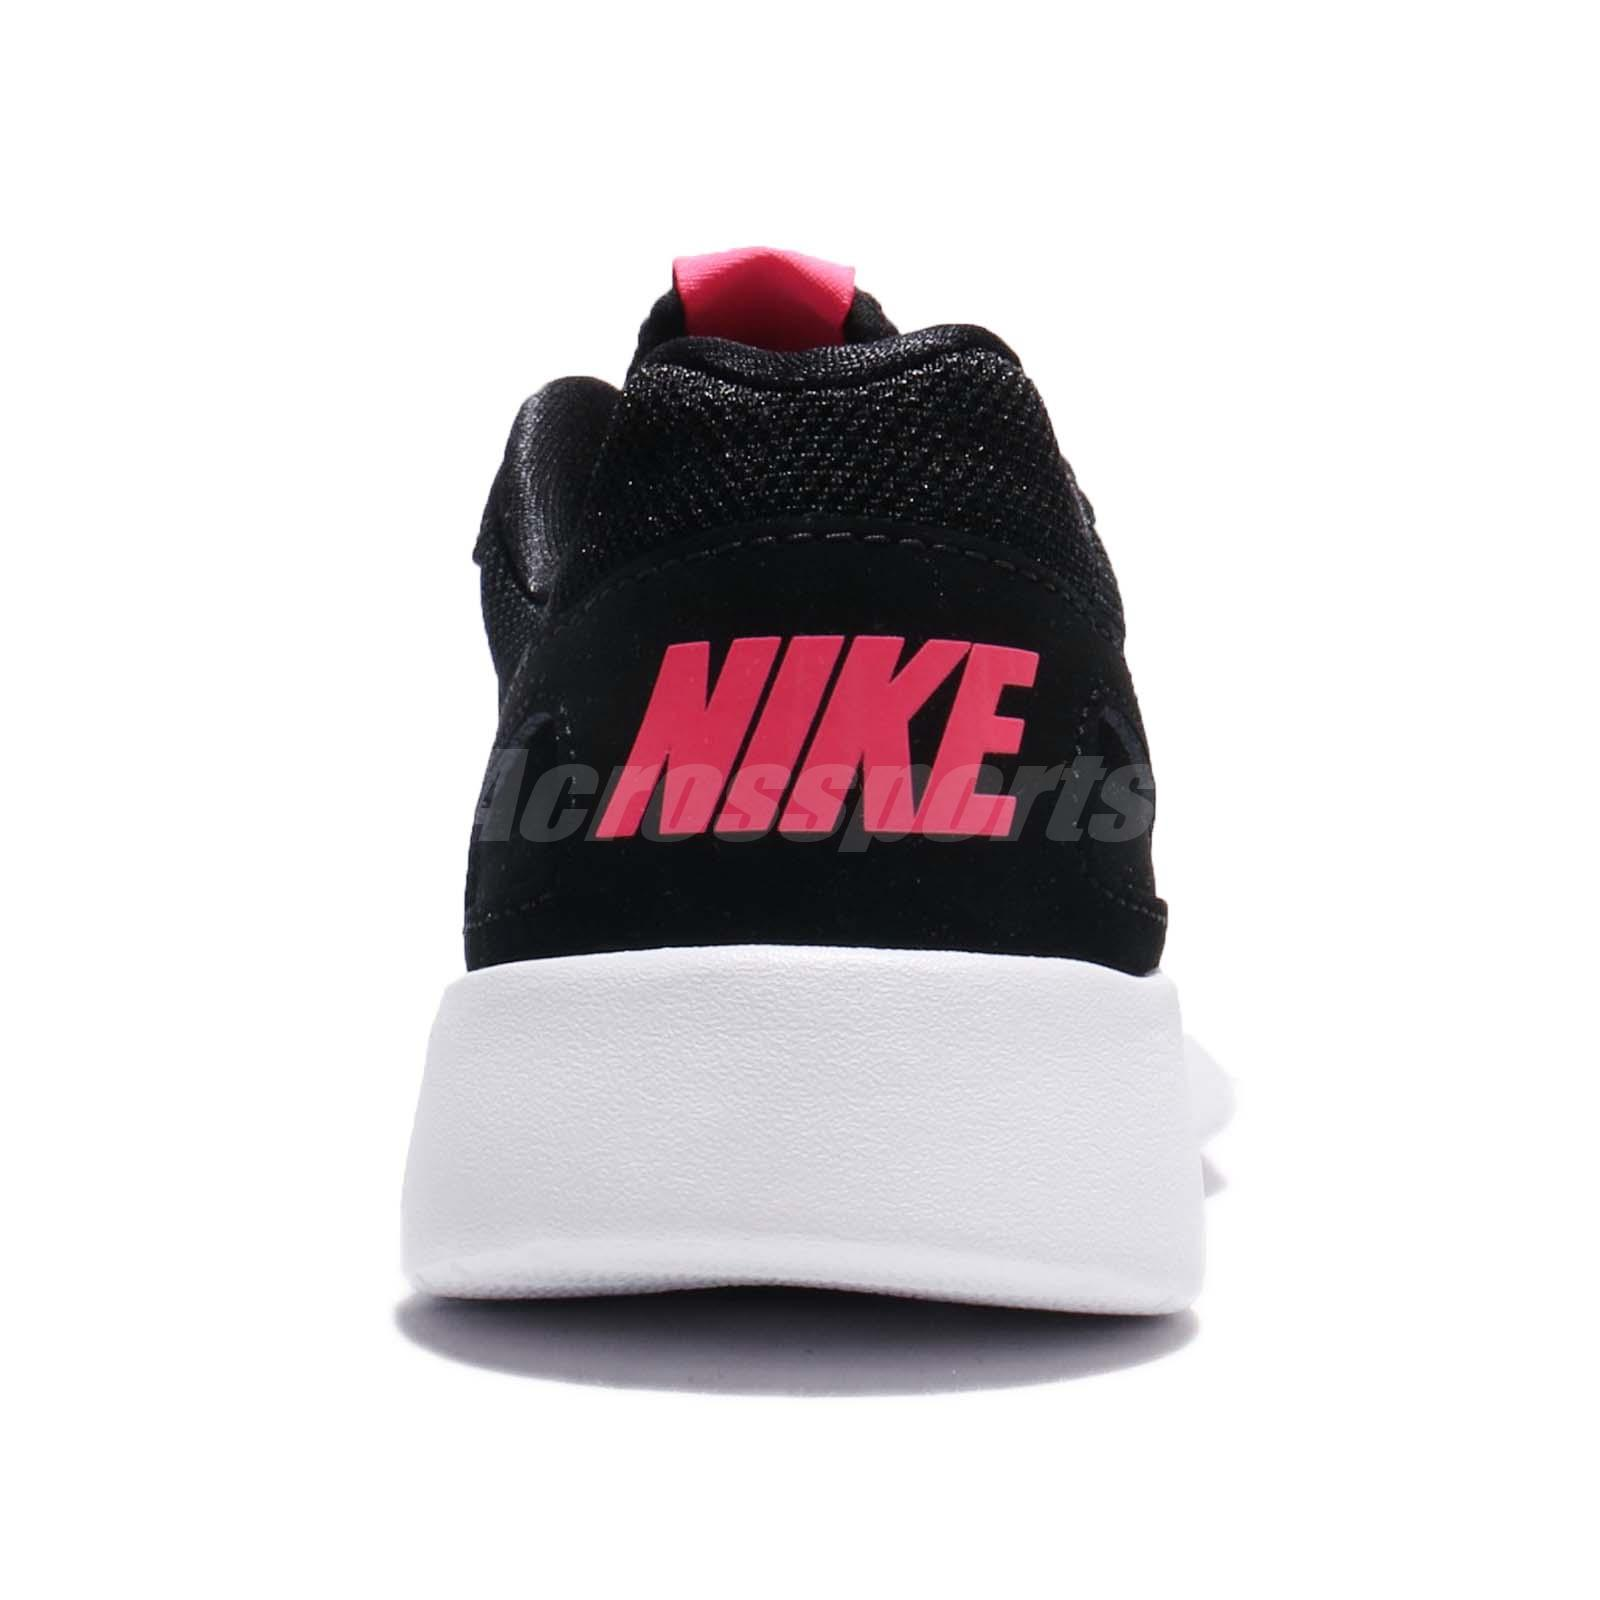 Nike Air Max 90 Essential Herre | Navy blåMetallic Sølv